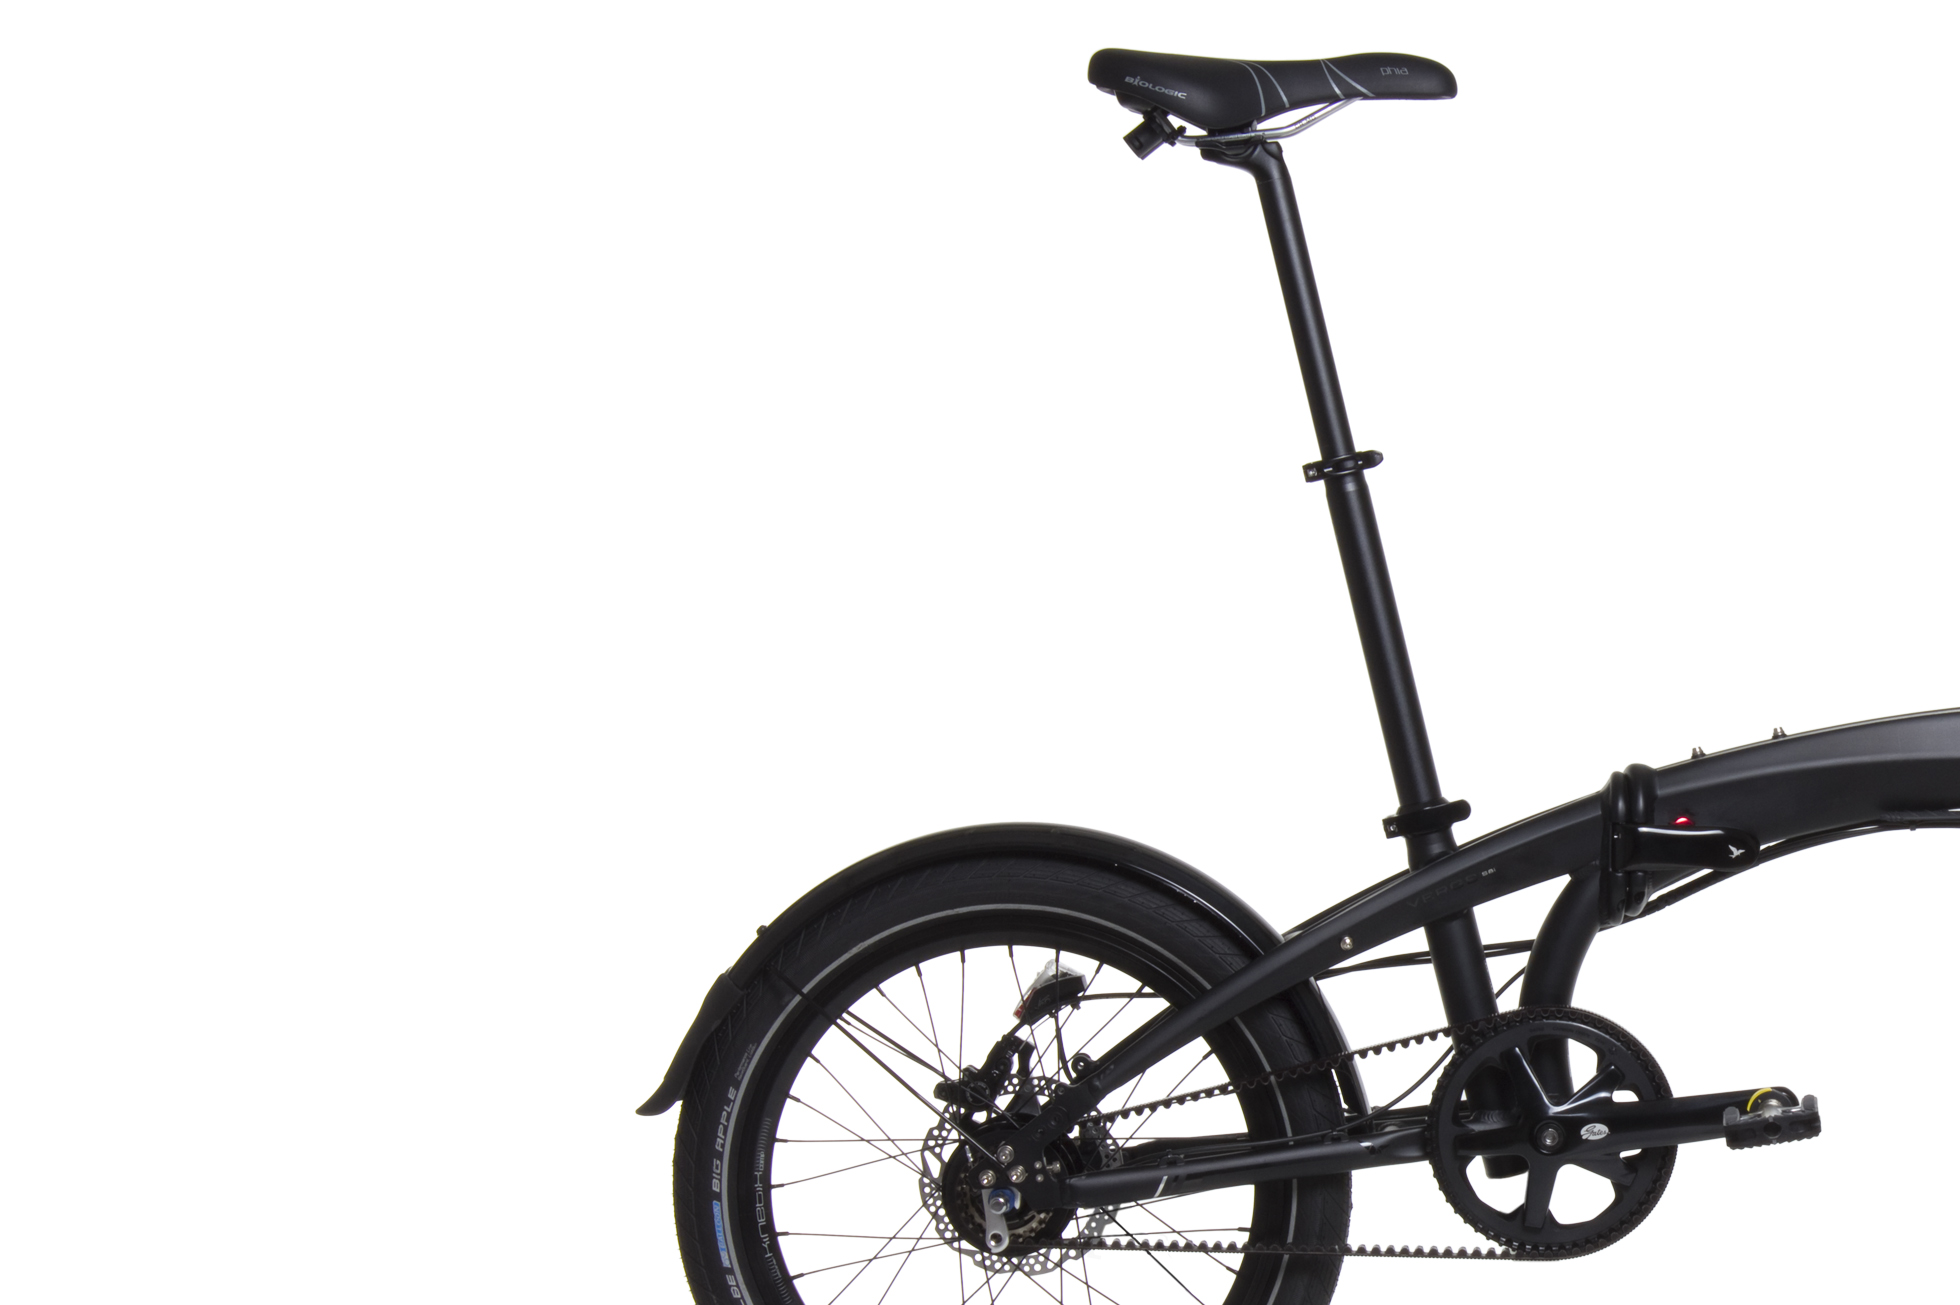 Folding Bike Seatpost Seat Post Foldable Bicycle Saddle Tube Component Parts